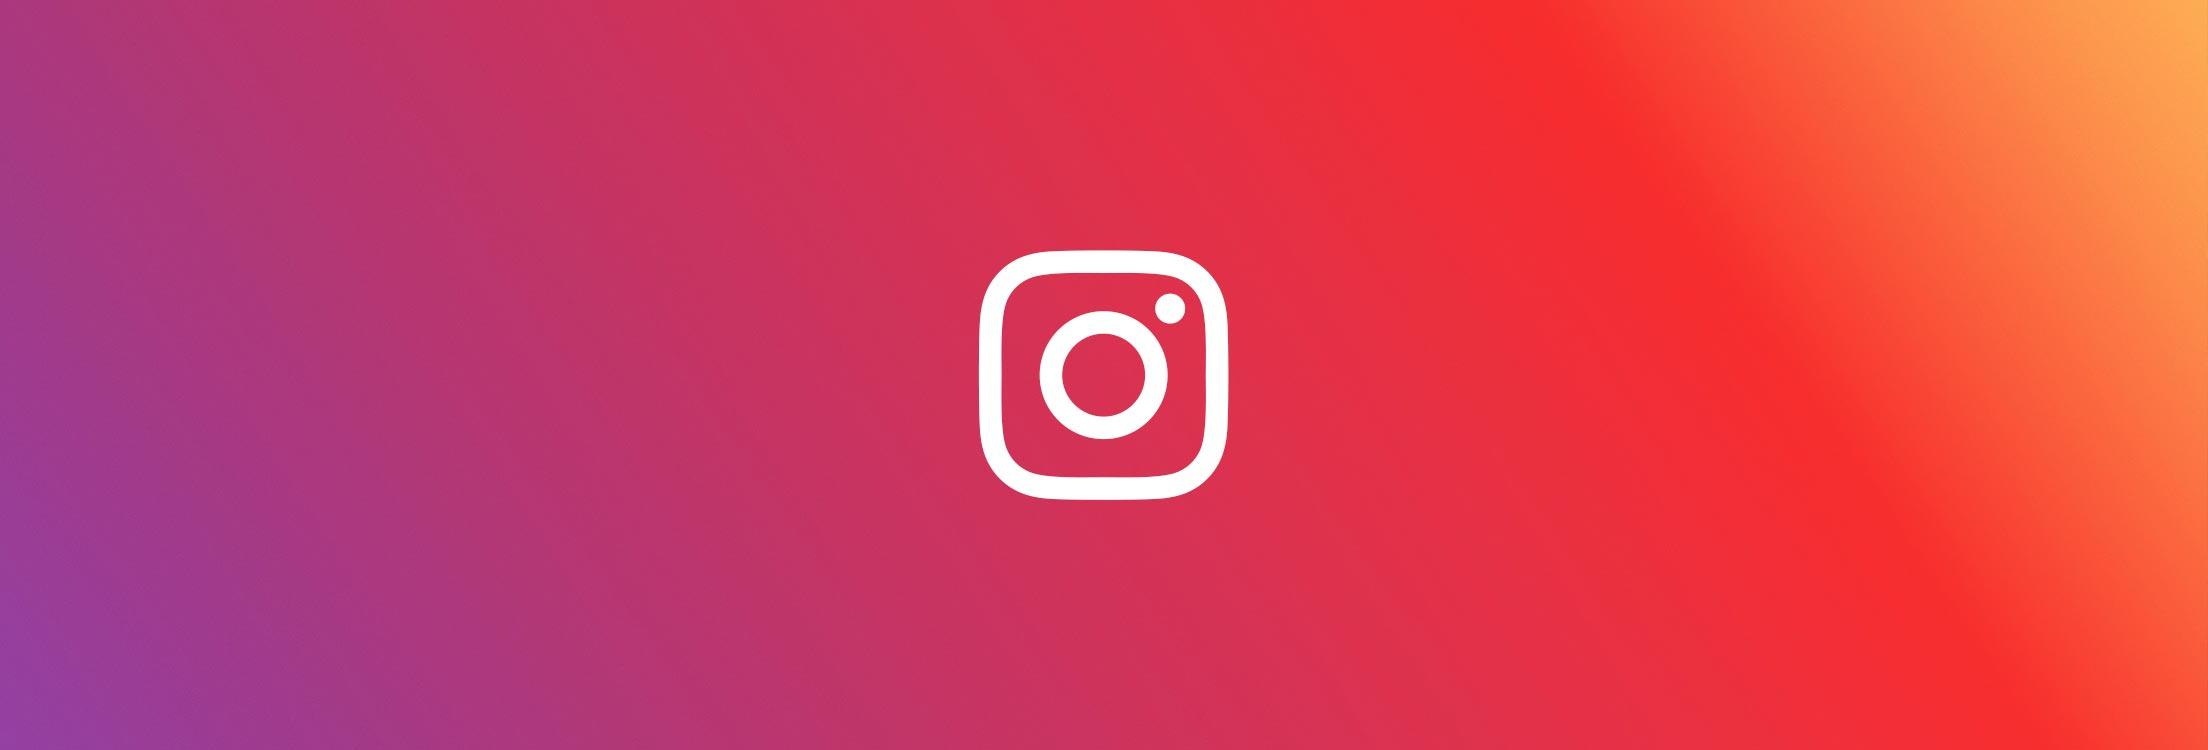 Rutkowski Development Instagram